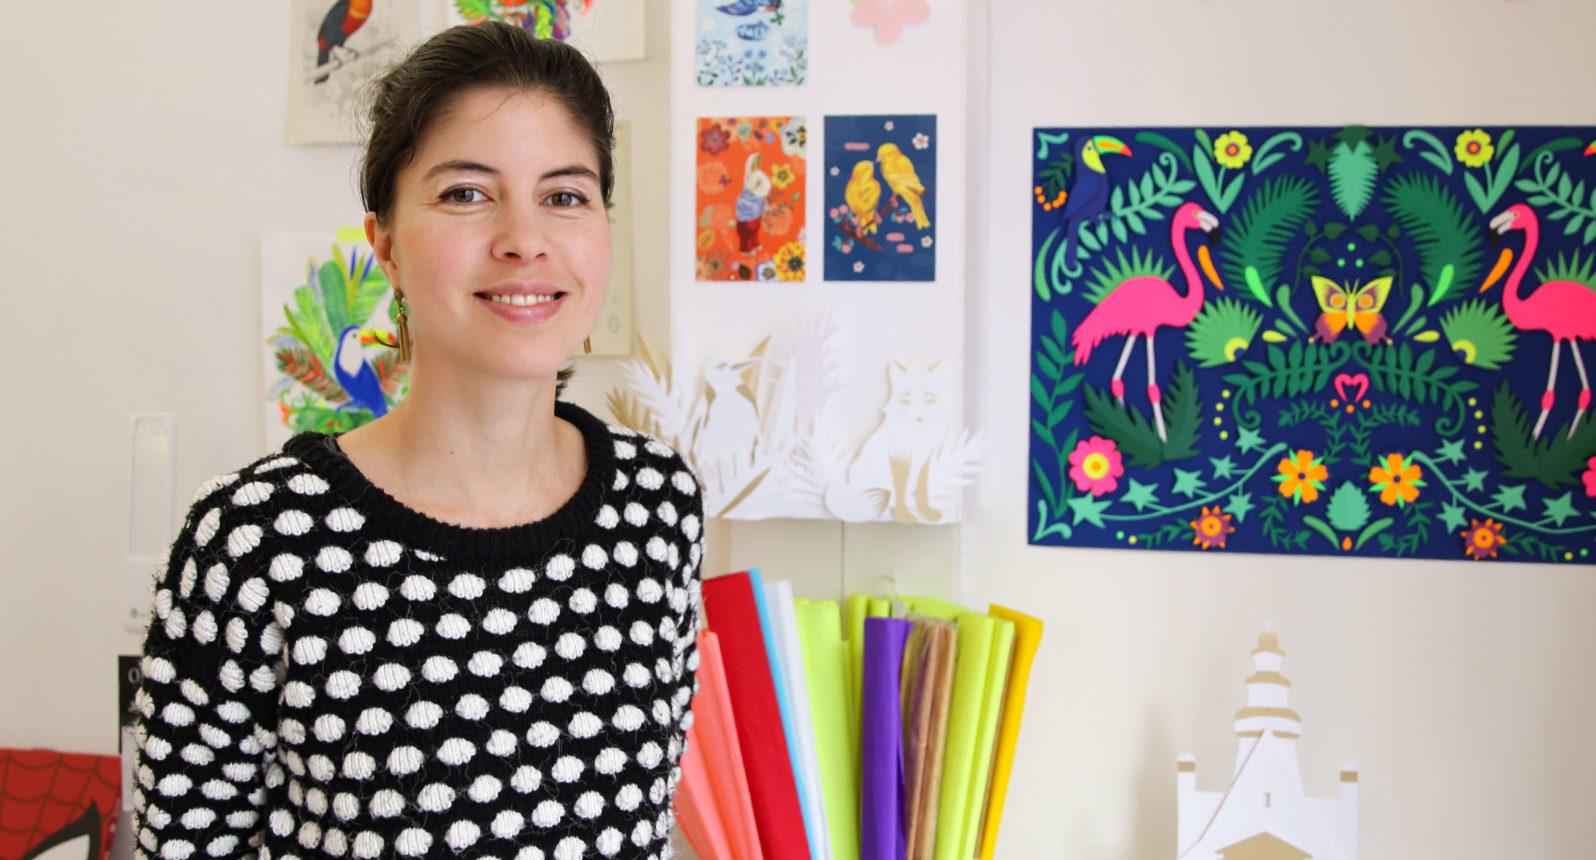 Rencontre avec Barbara Cadet artiste papier - Souffle Chaud Webzine Culturel